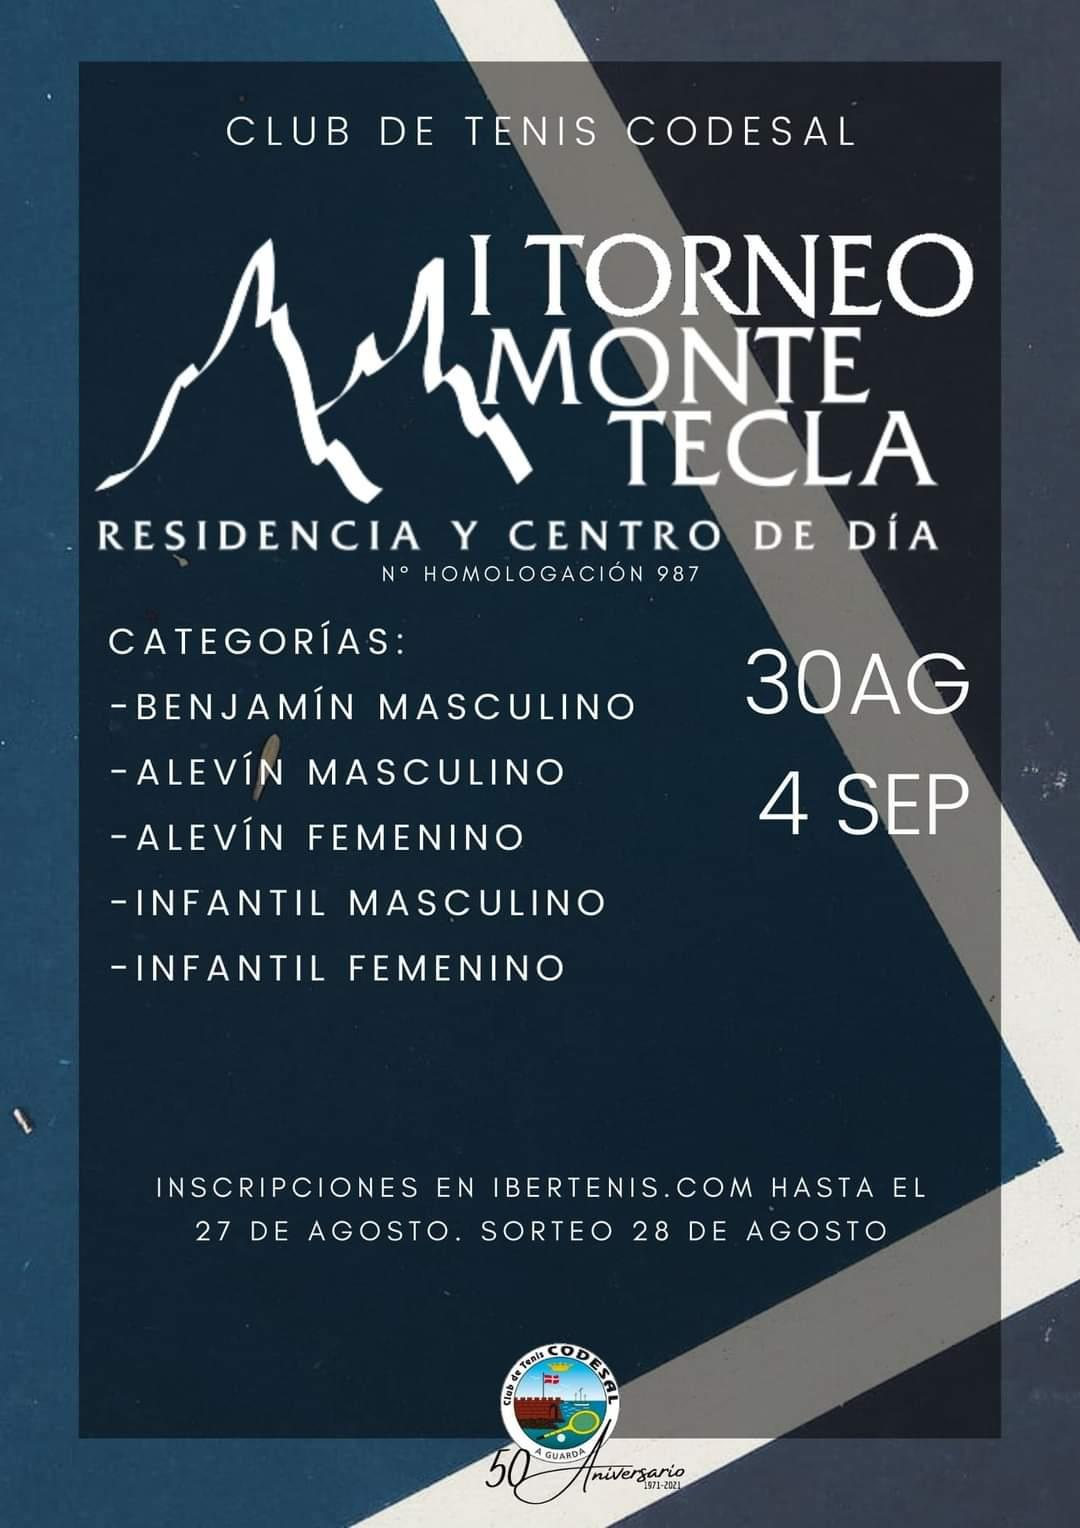 I Torneo Monte Tecla del 30 de agosto al 4 de 3 septiembre 2021